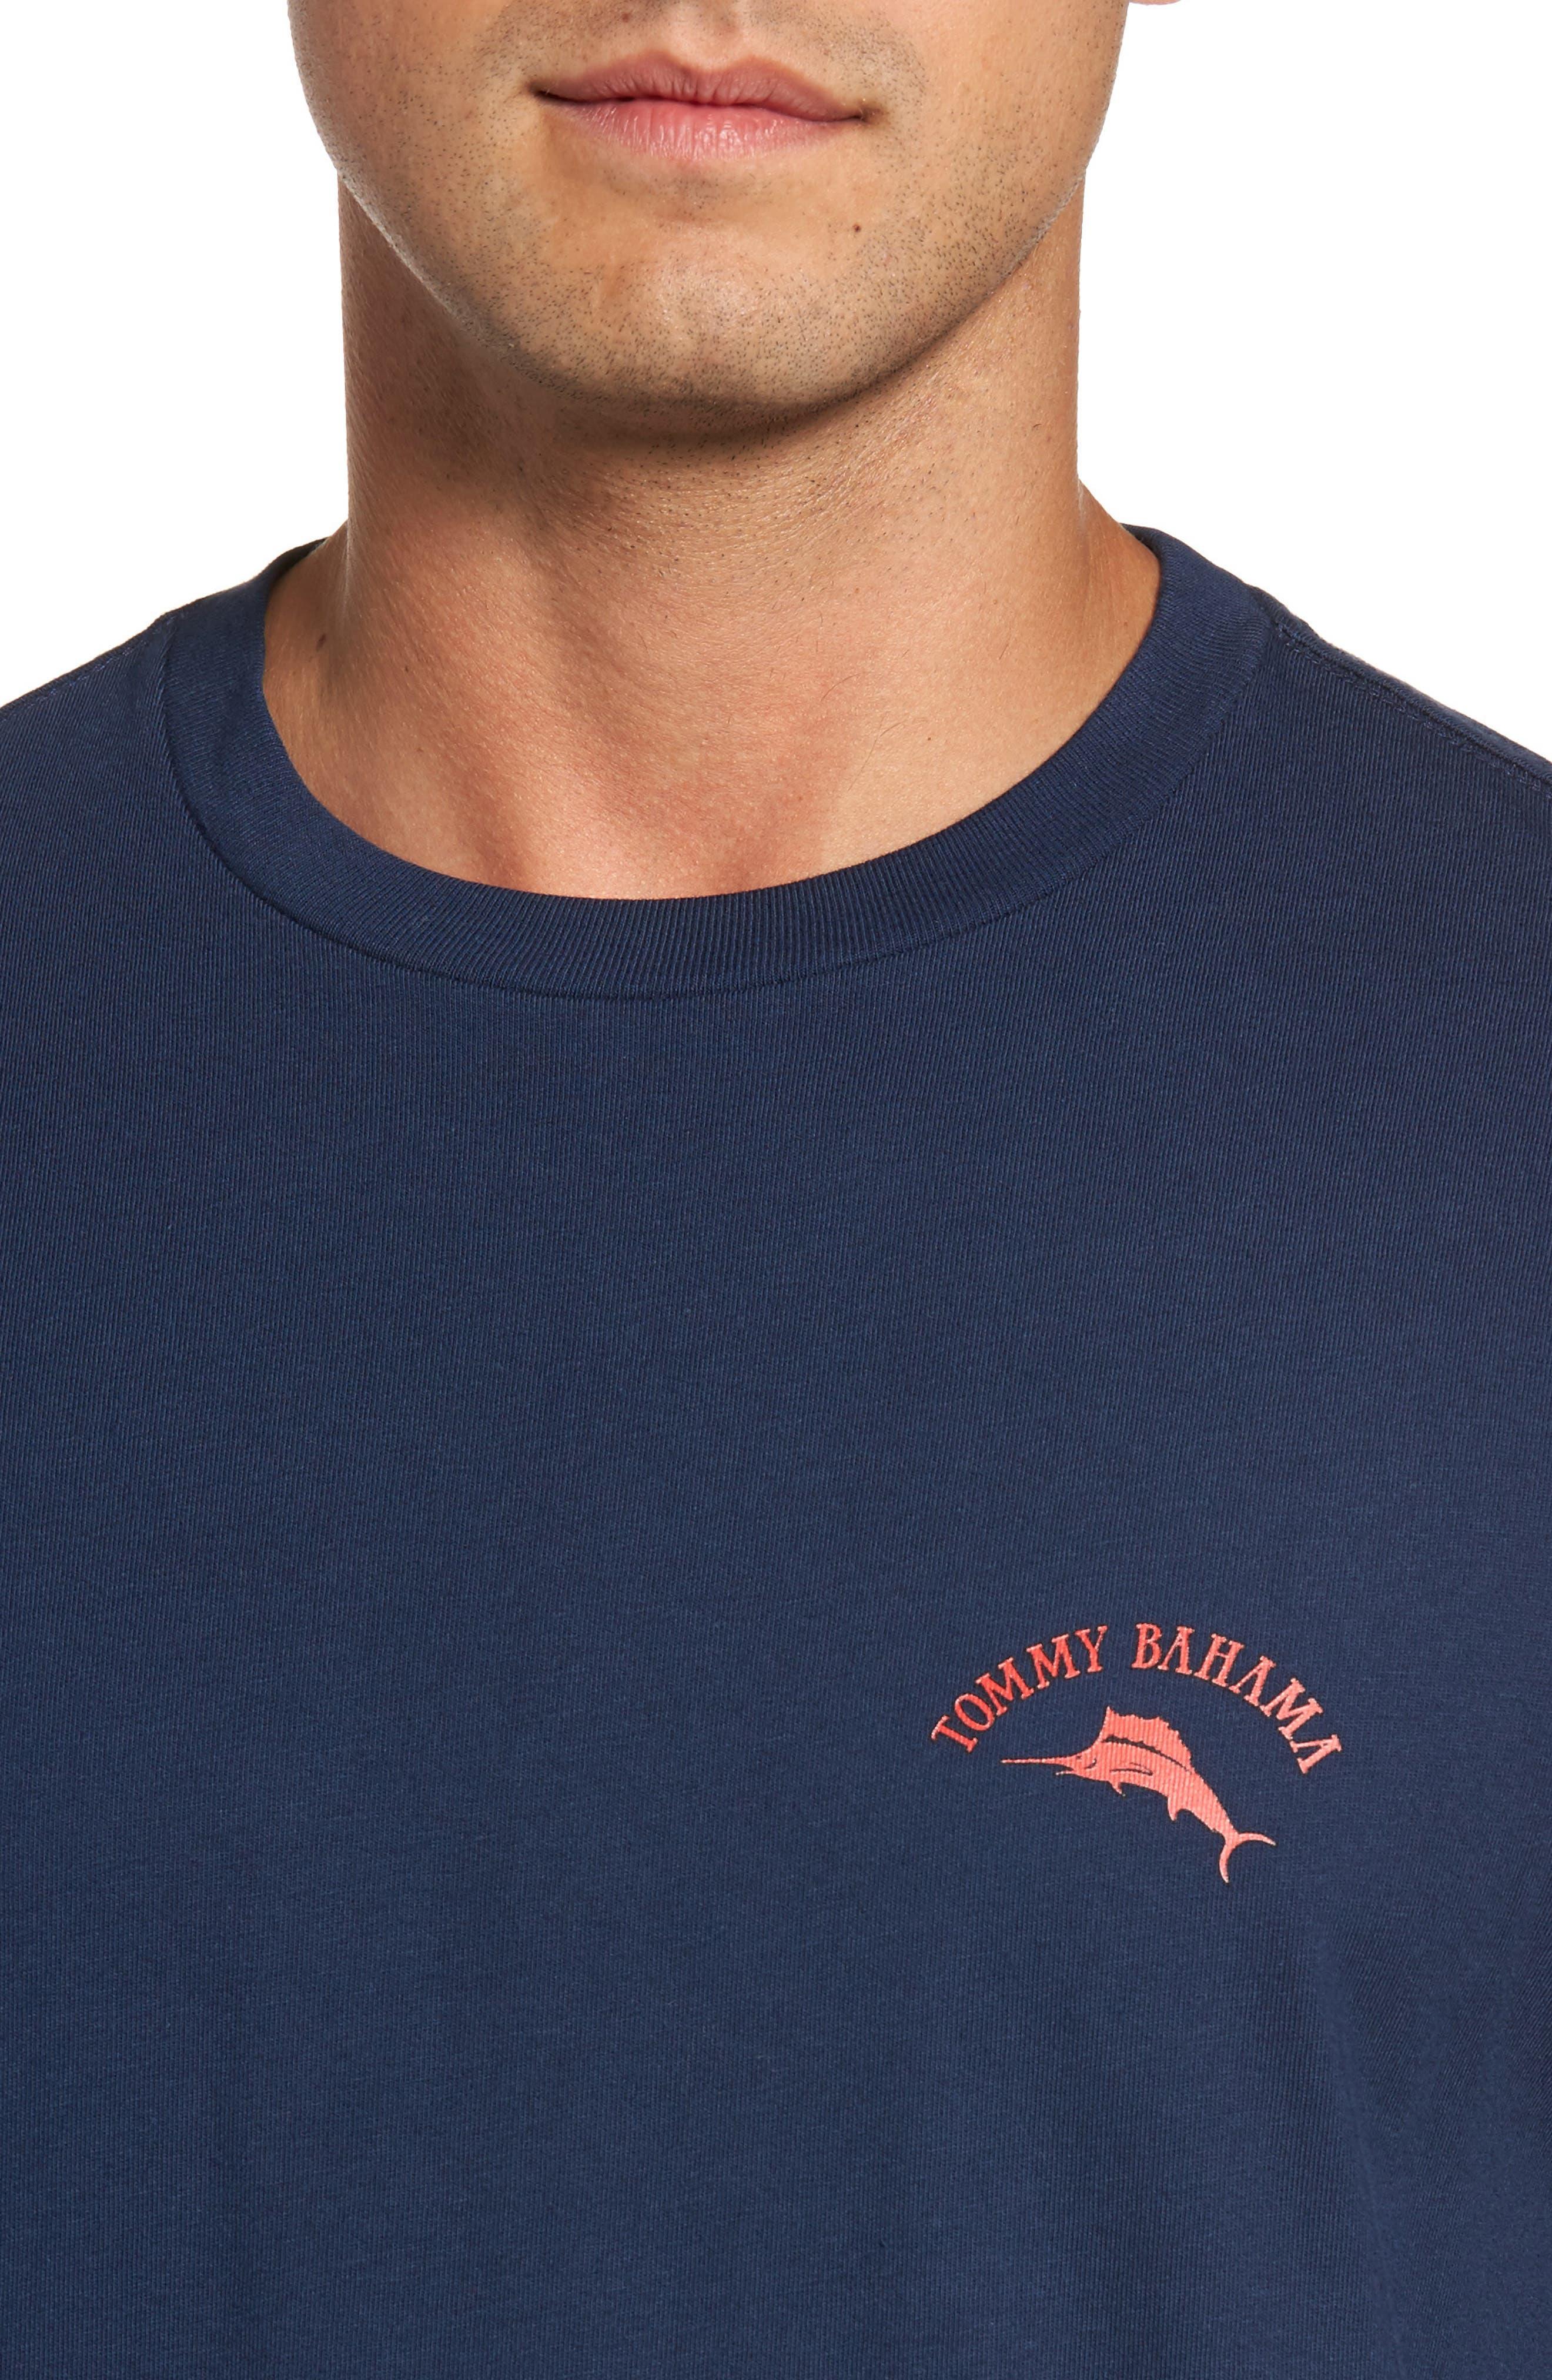 Alternate Image 4  - Tommy Bahama Big Boats Standard Fit T-Shirt